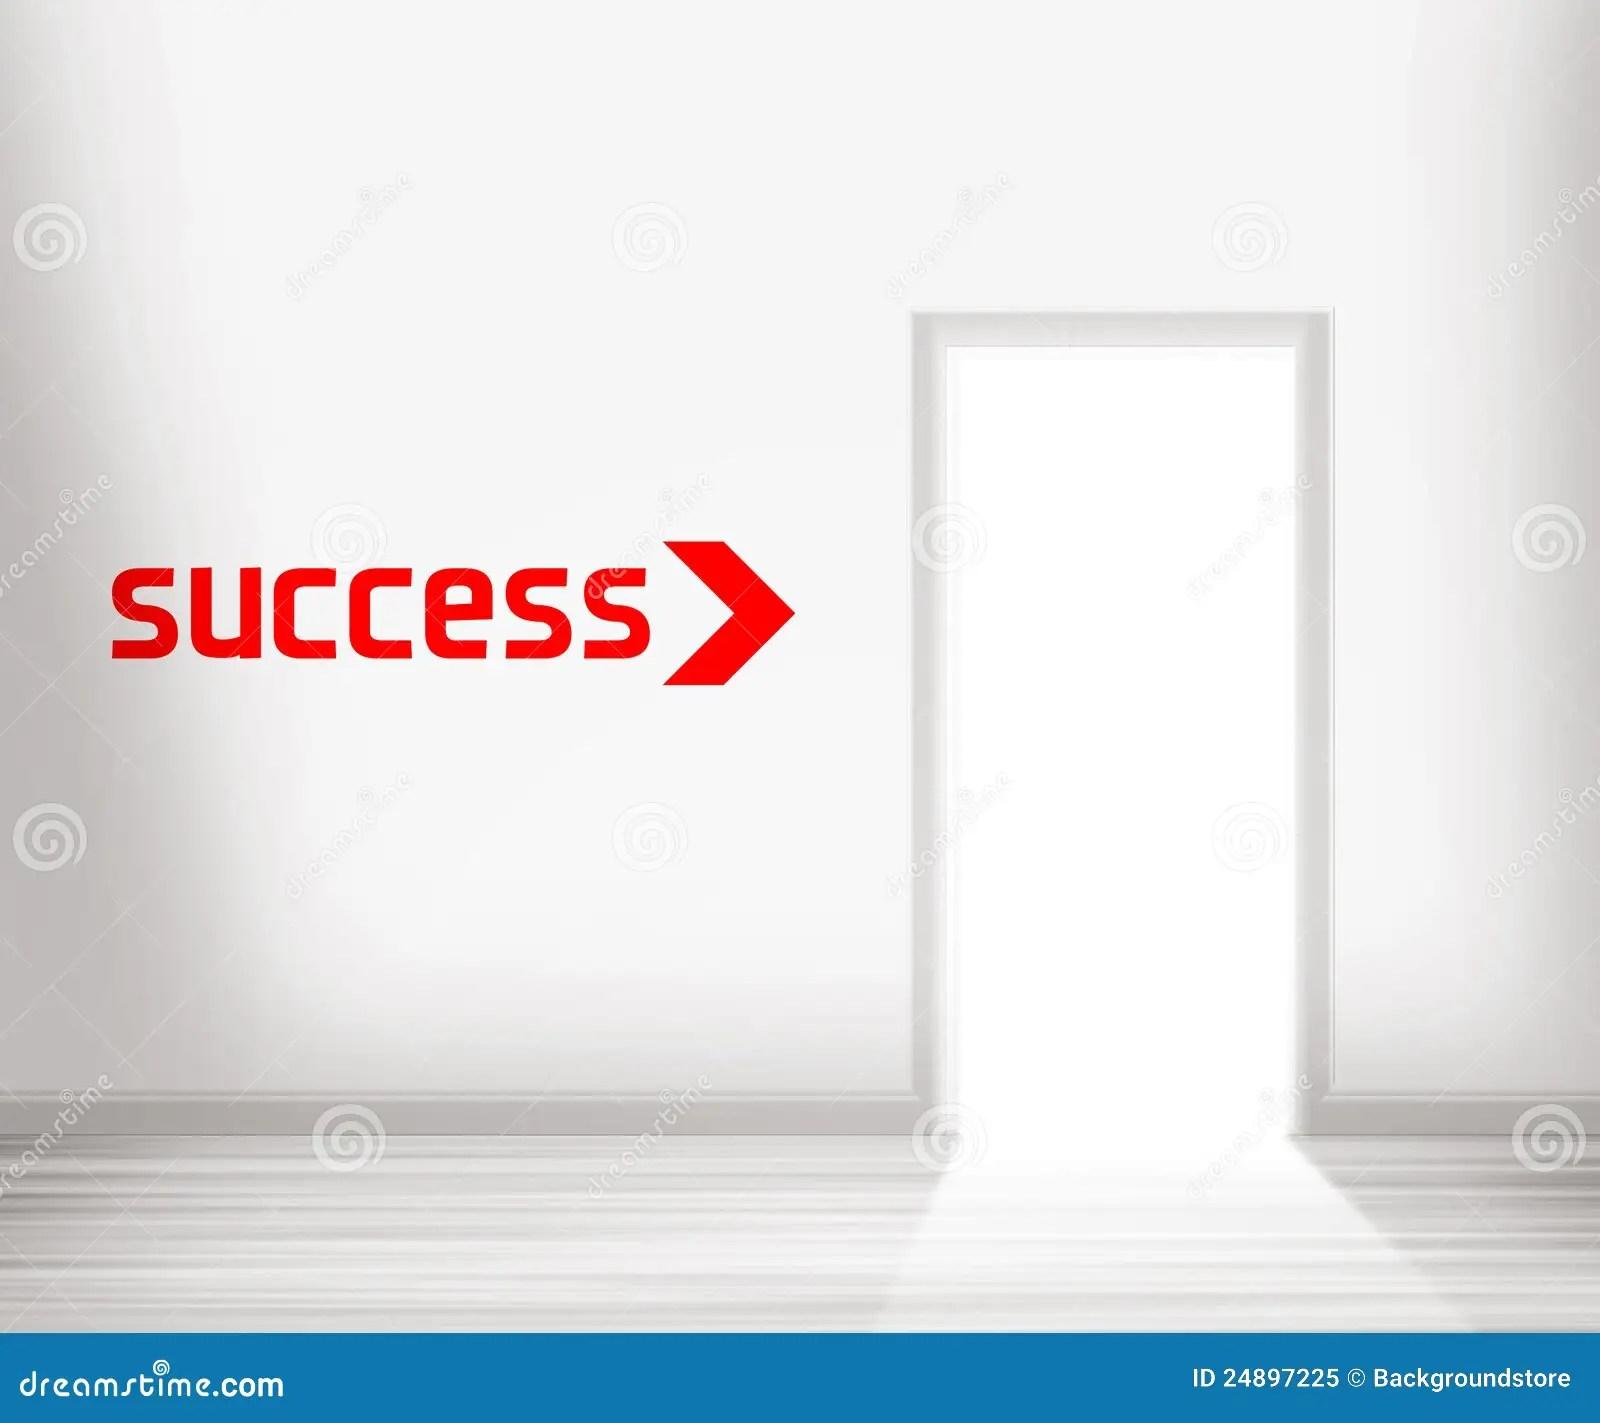 Door To Success Royalty Free Stock Photo - Image: 24897225